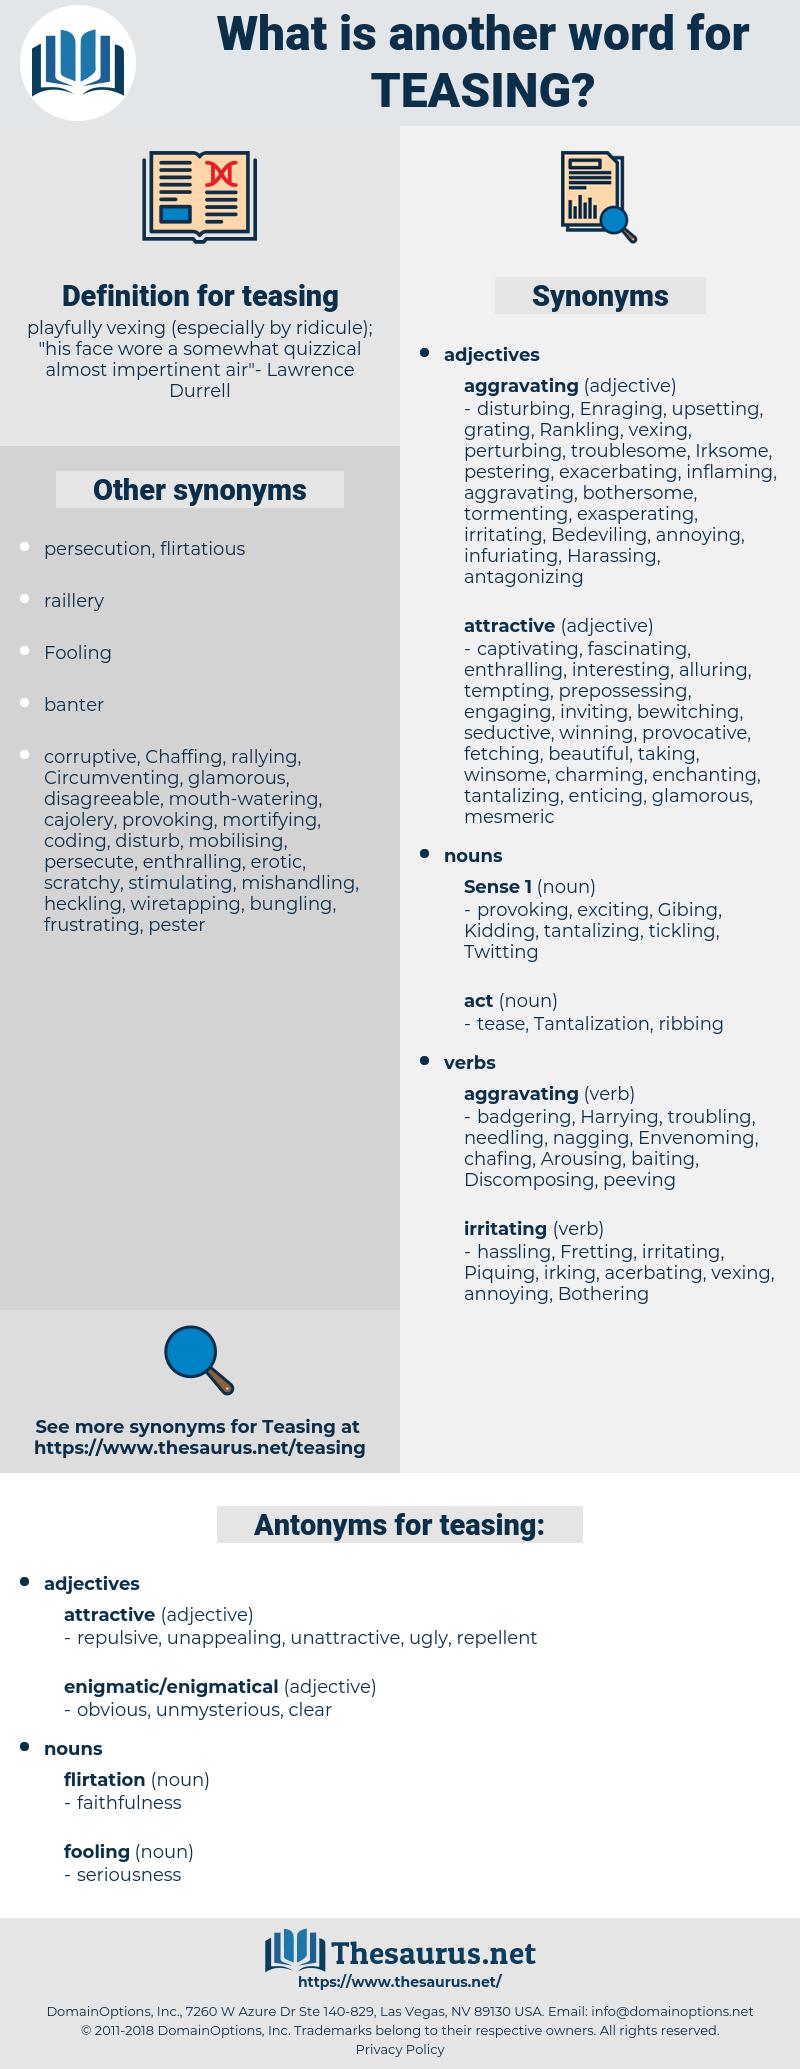 teasing, synonym teasing, another word for teasing, words like teasing, thesaurus teasing